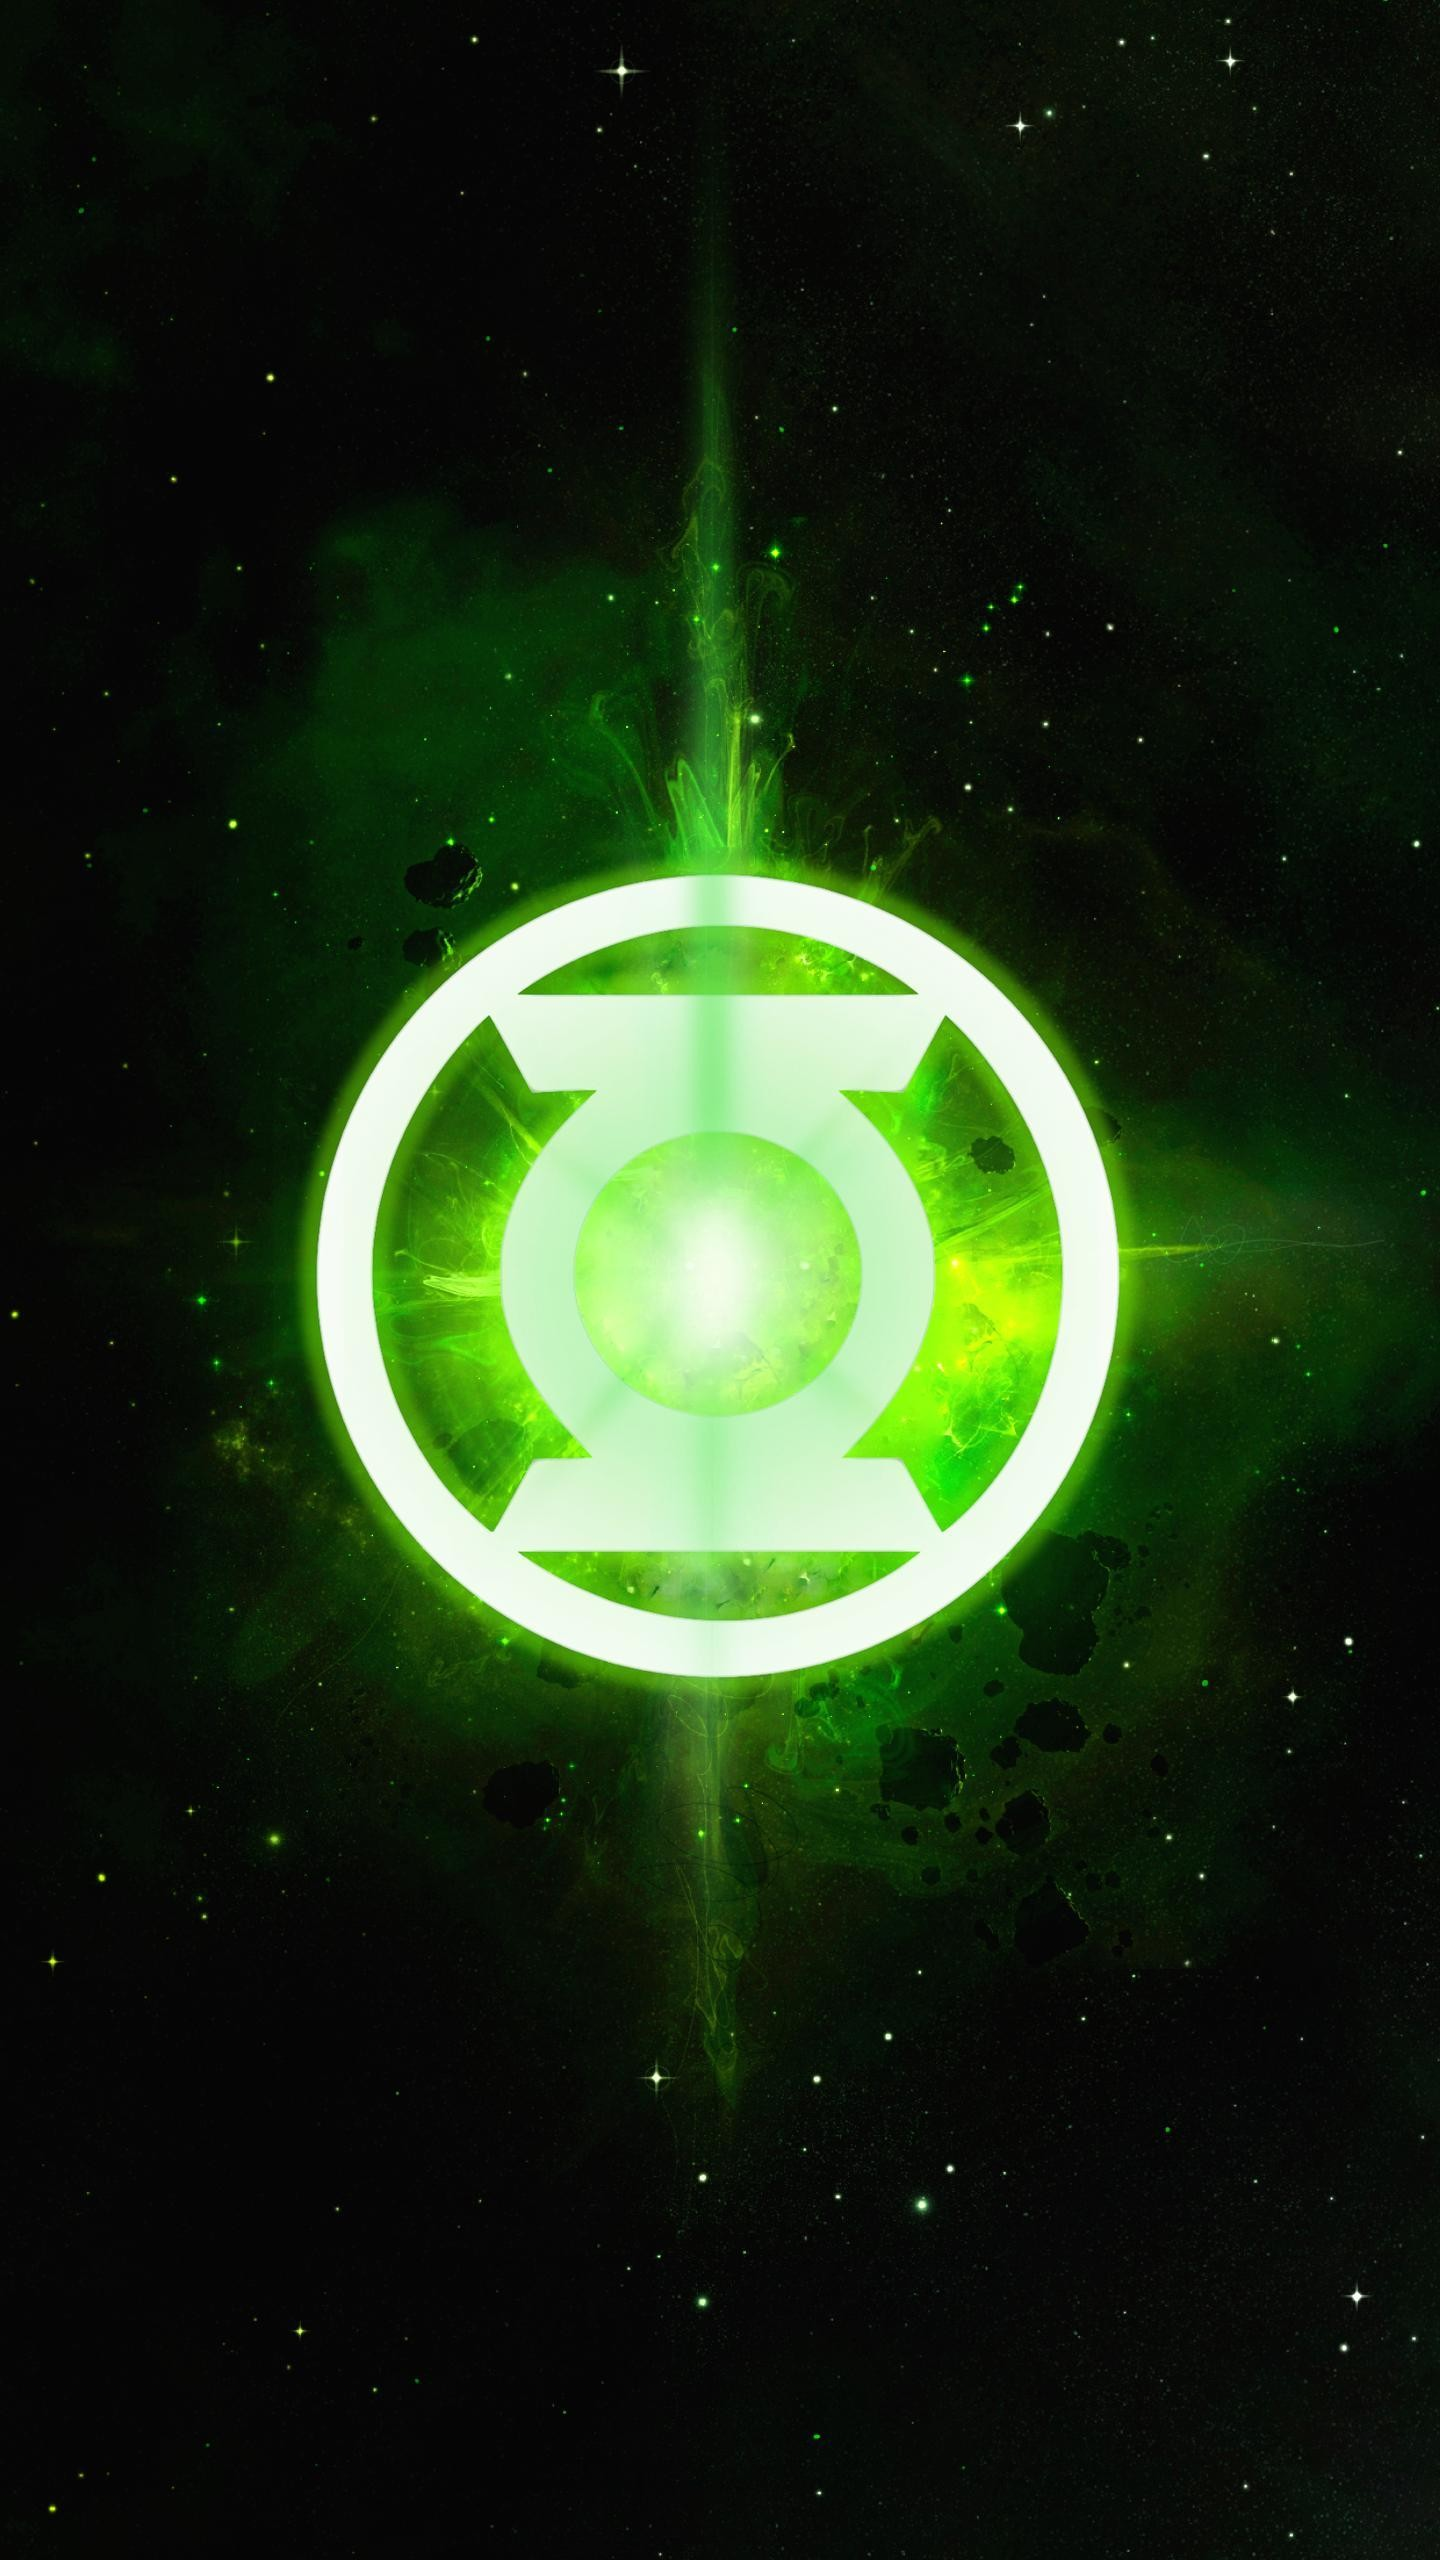 Green Lantern Corps (Will)